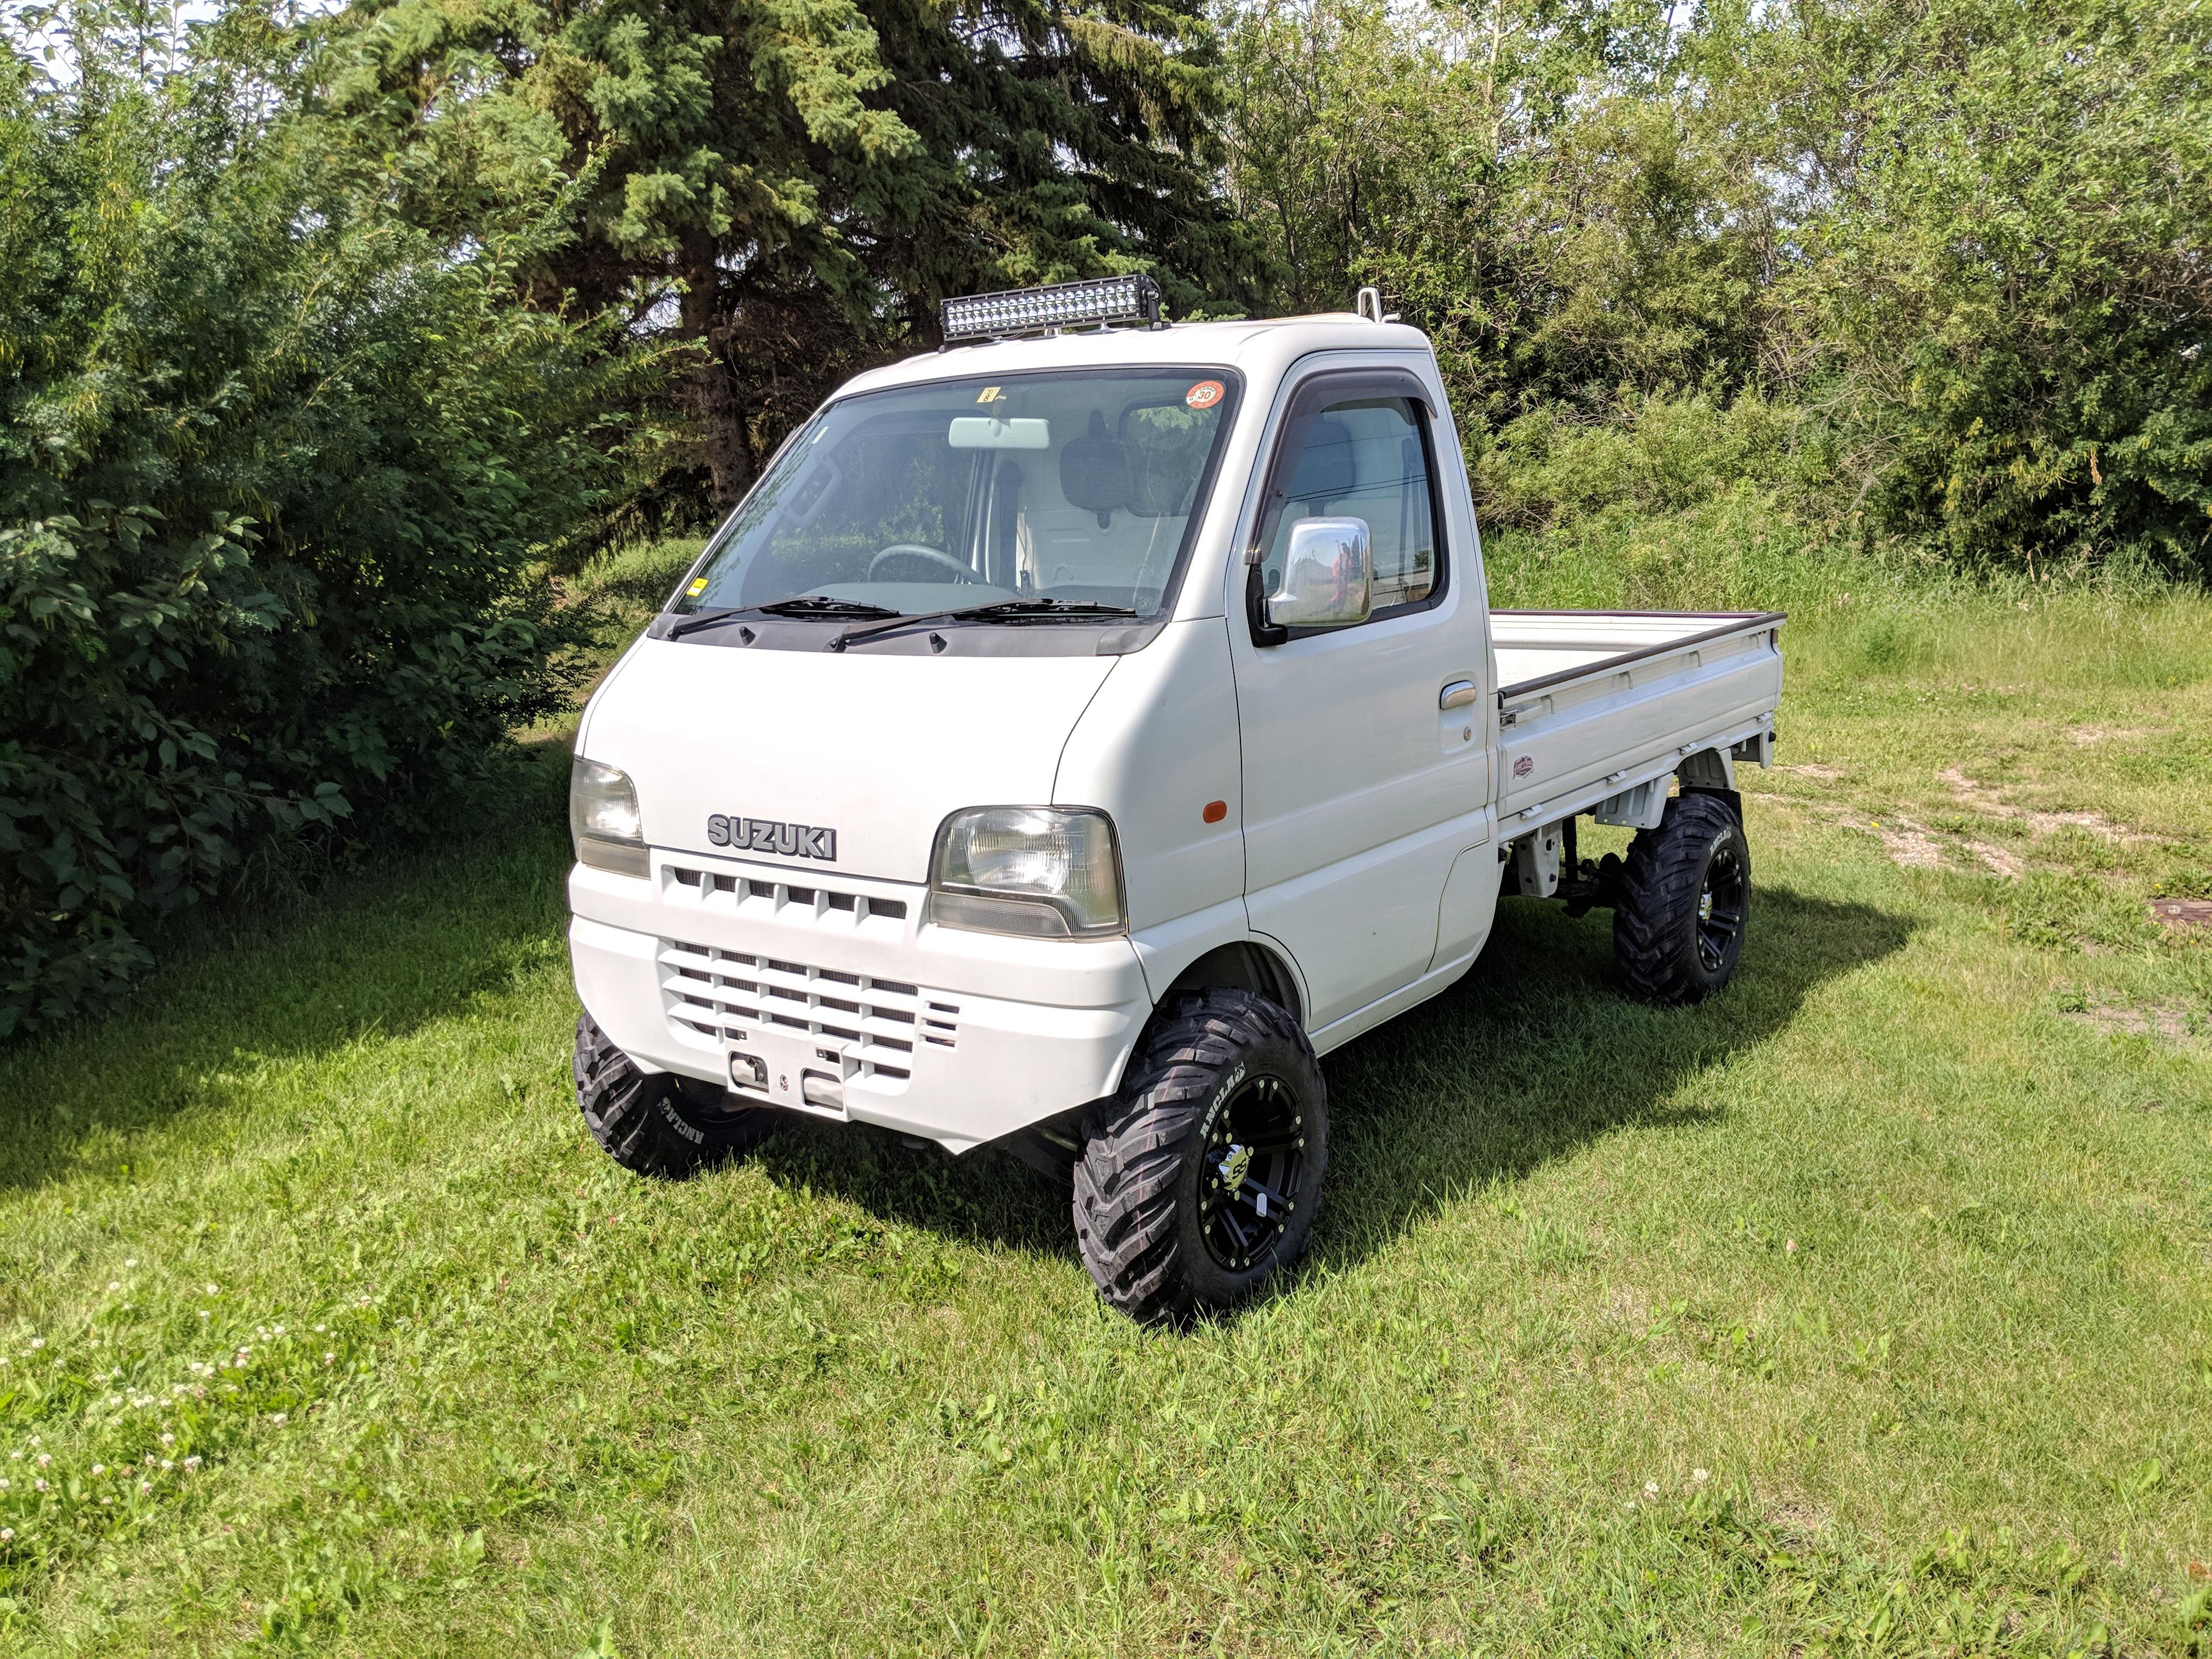 2001 Suzuki Carry DB52T w/ATV Tires